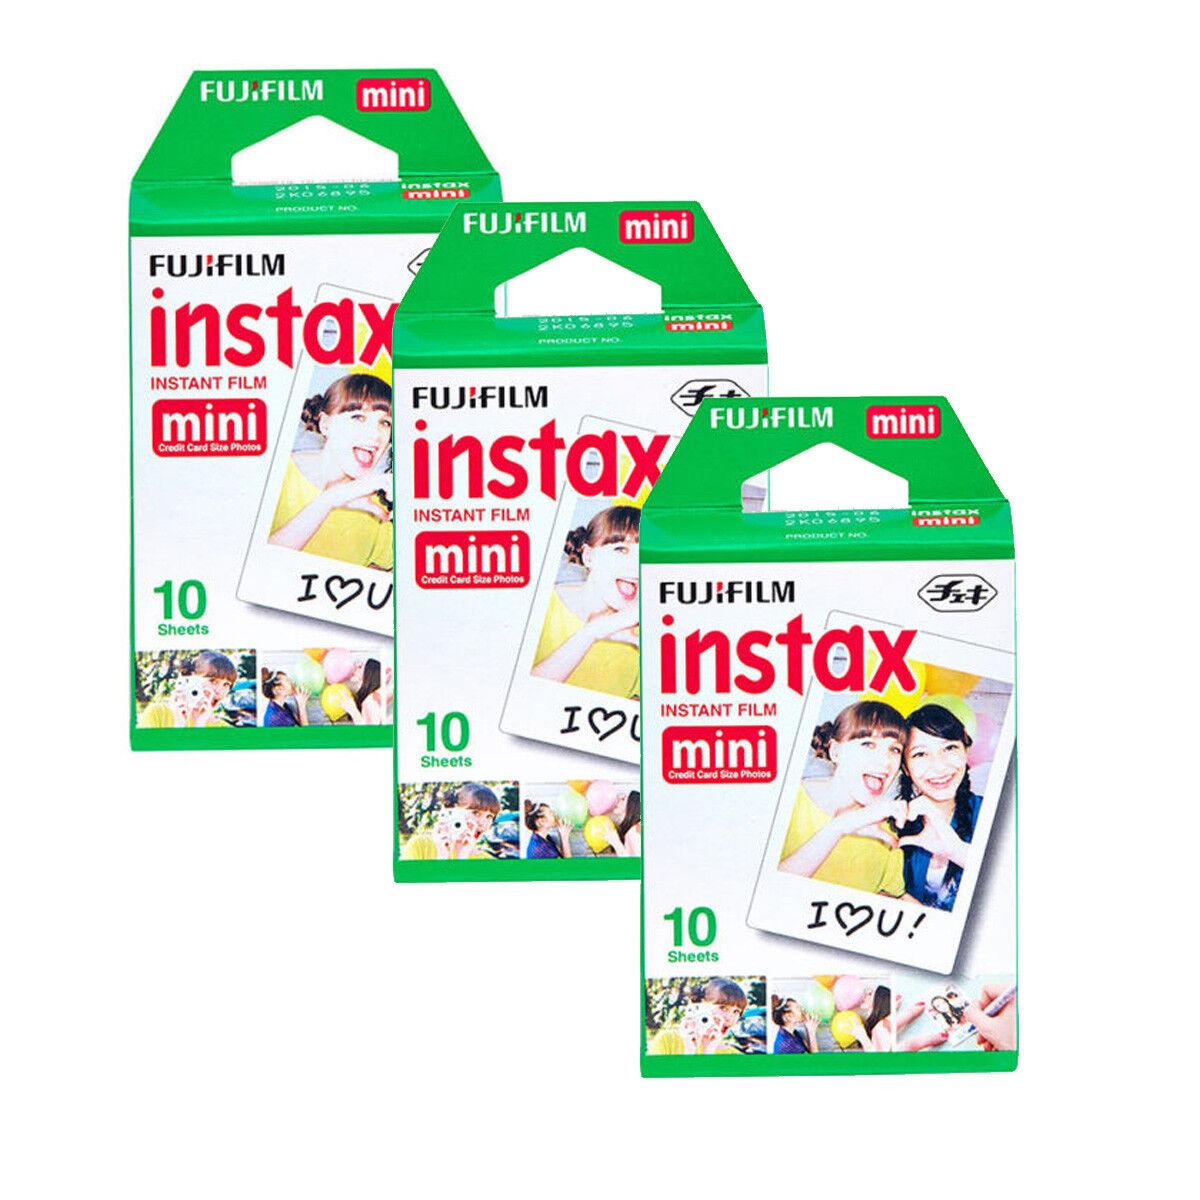 Fujifilm Instax Mini Instant Film 30 Prints for Fuji 90, 9, 8, 7S, 50S 25 Camera